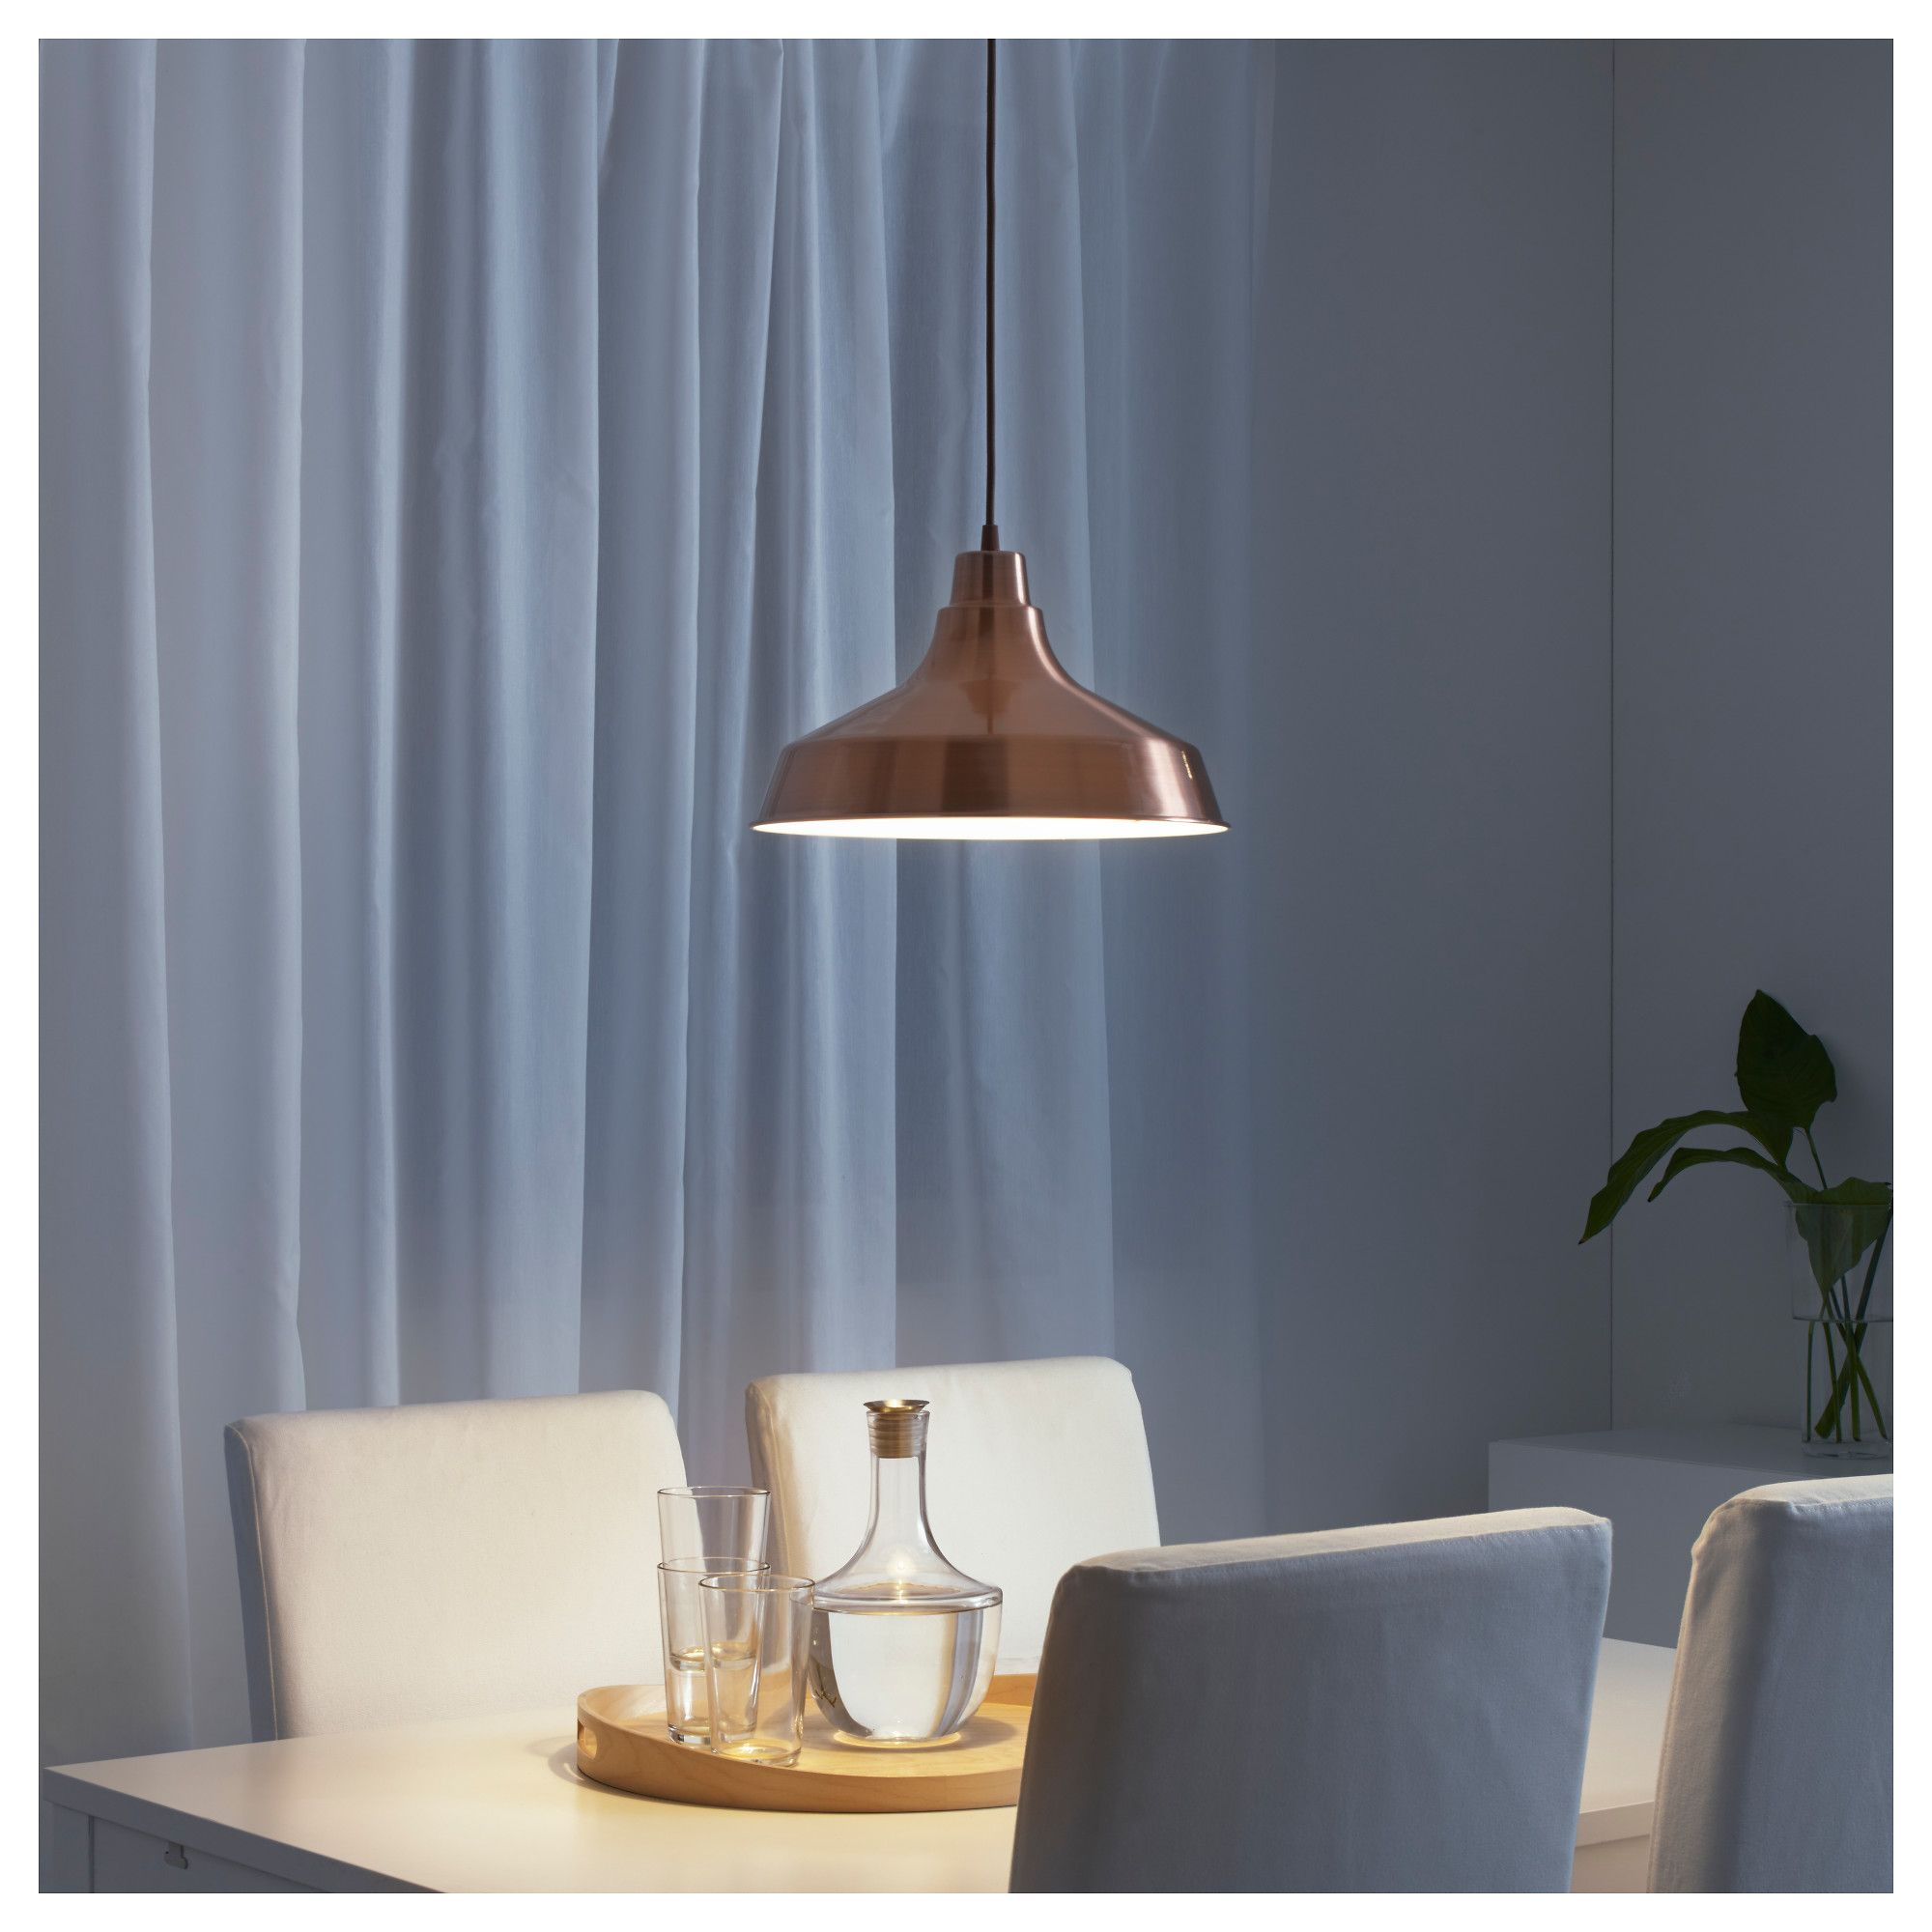 Ikea VindkÅre Copper Pendant Lamp